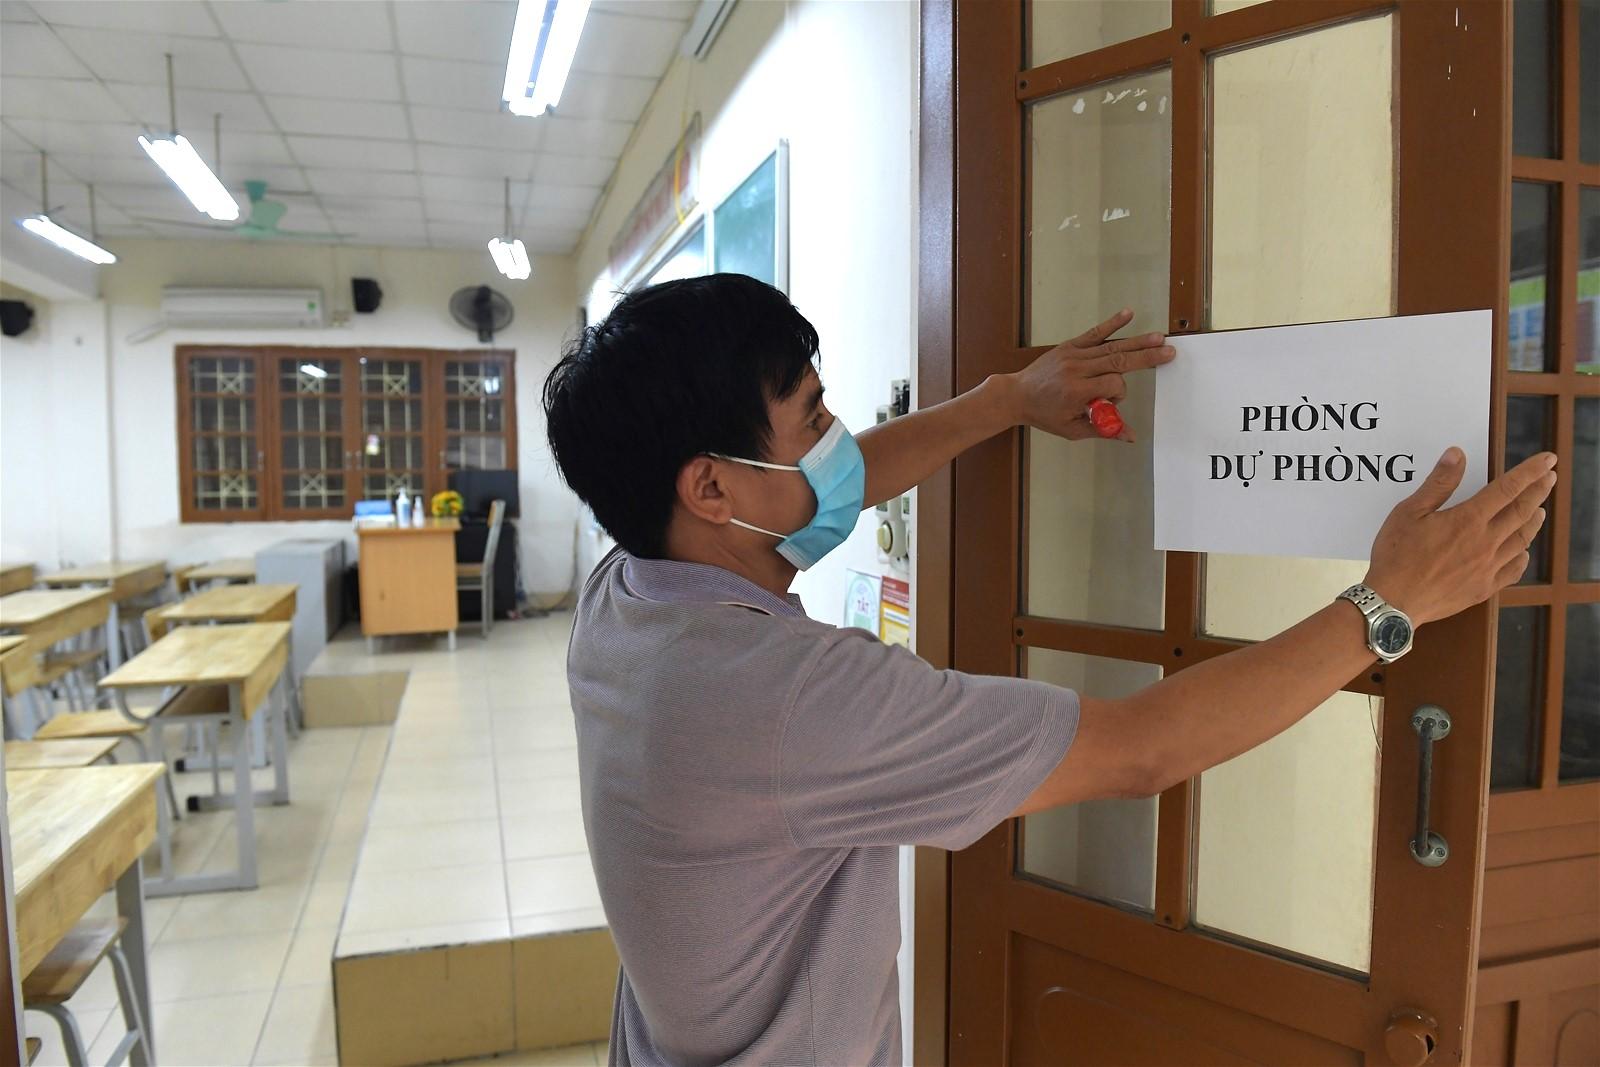 Vietnam 2020 high school grad exam_isolated room